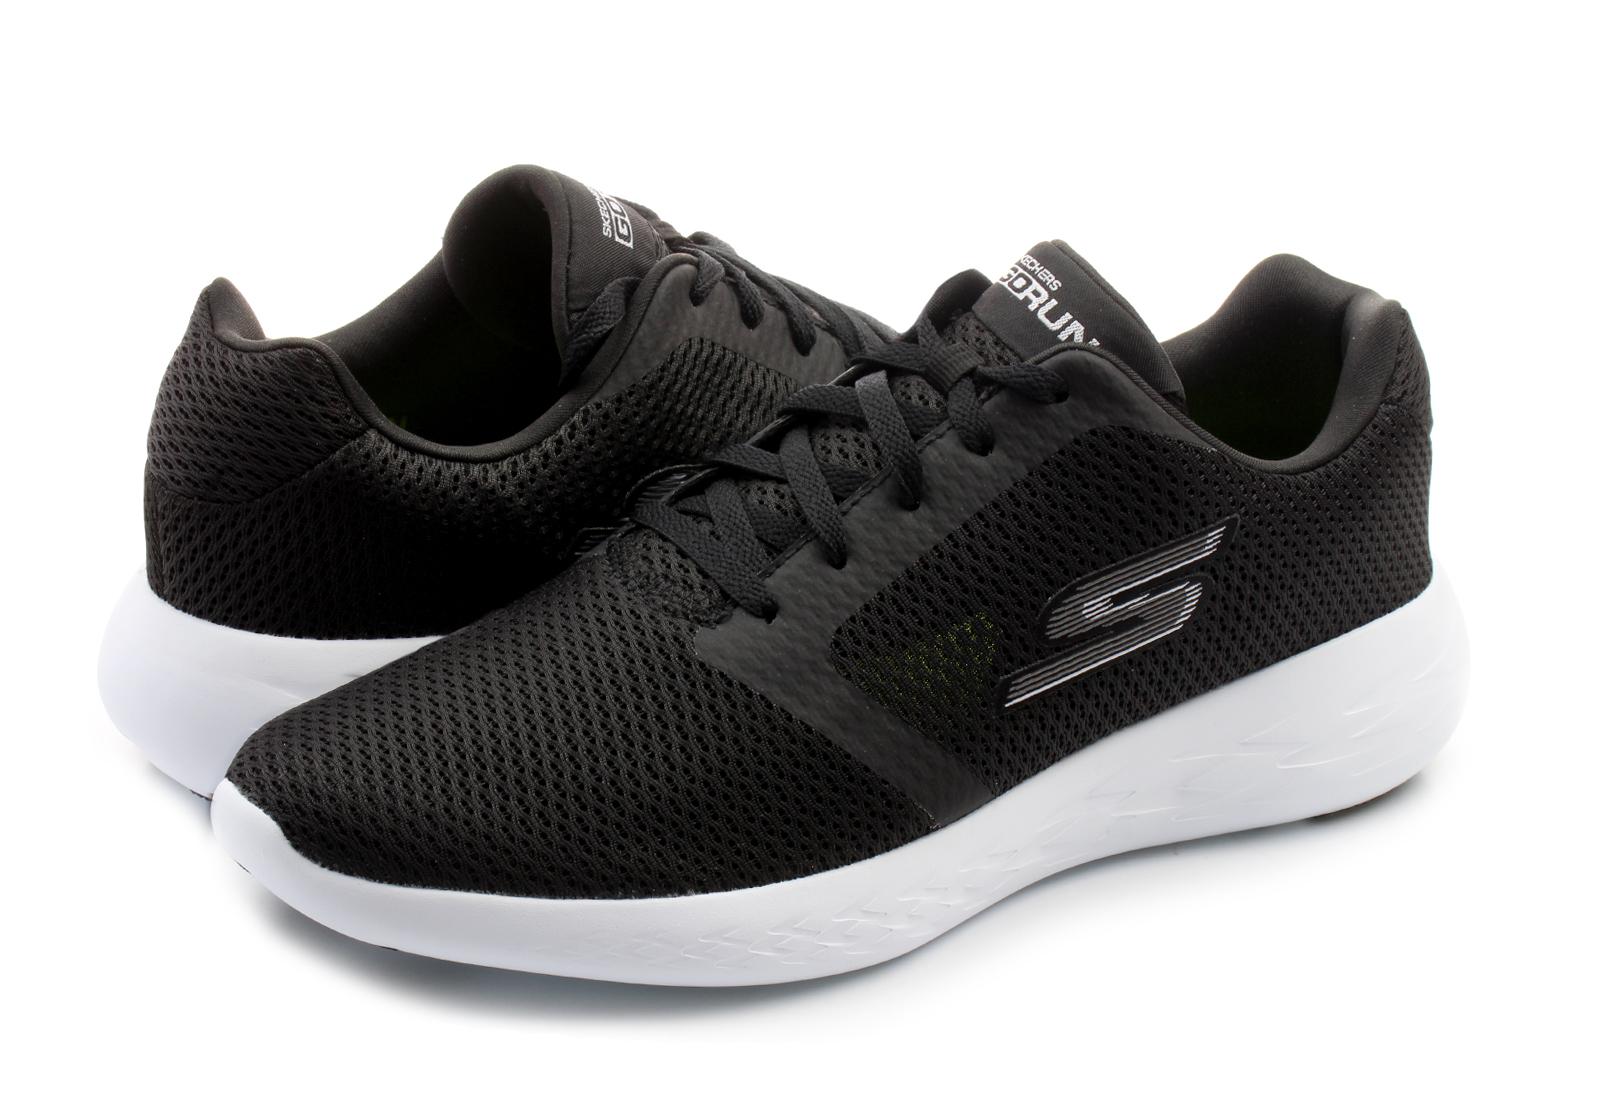 Skechers Shoes Go Run 600 Refine 55061 Bkw Online